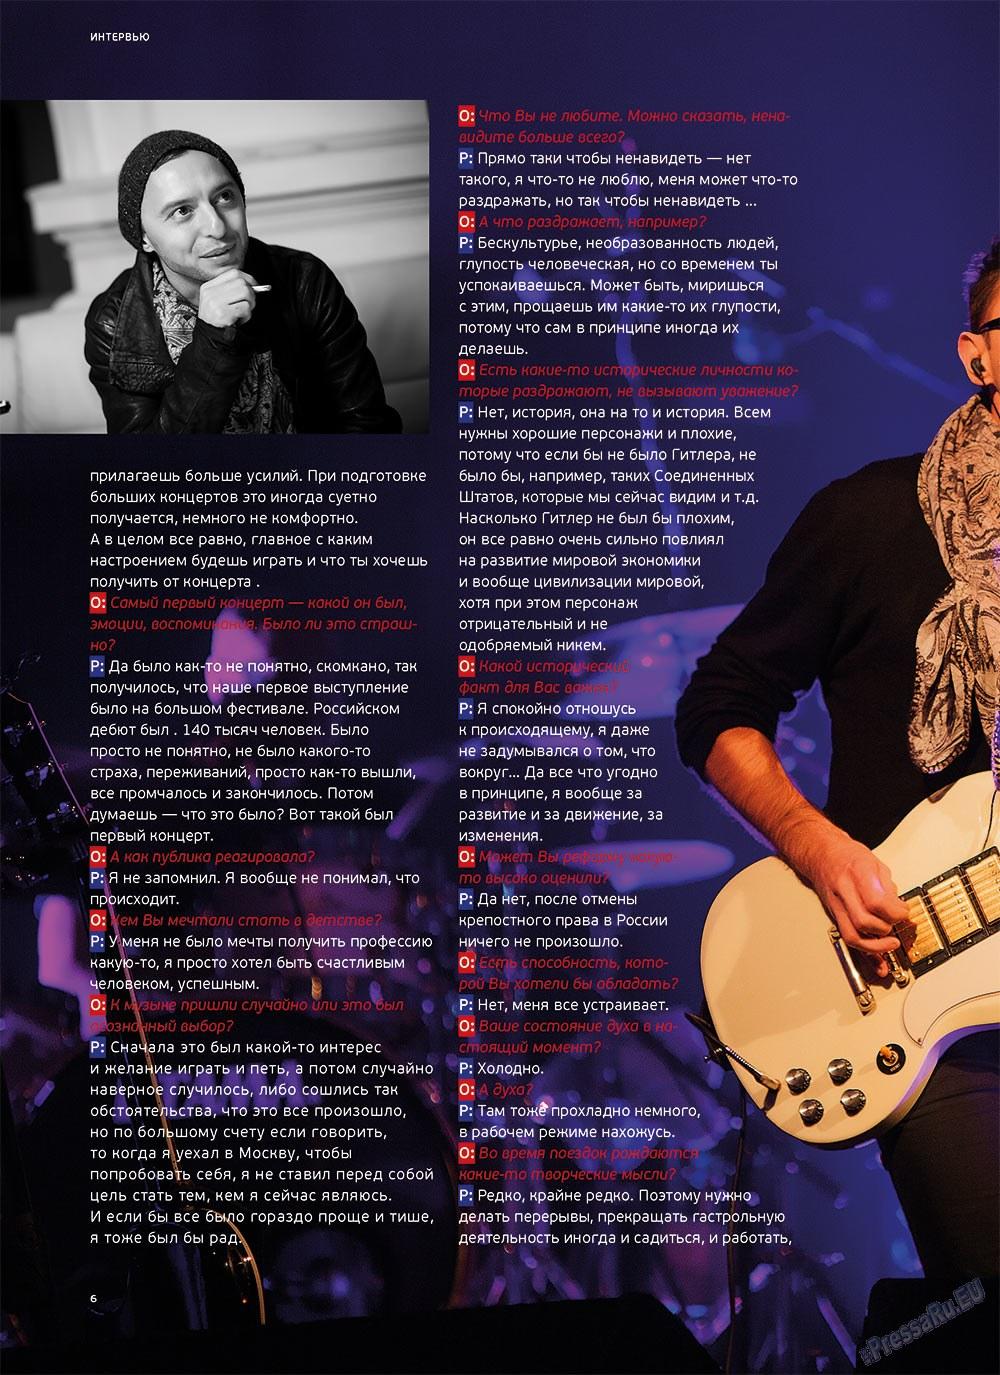 Артек (журнал). 2012 год, номер 5, стр. 8